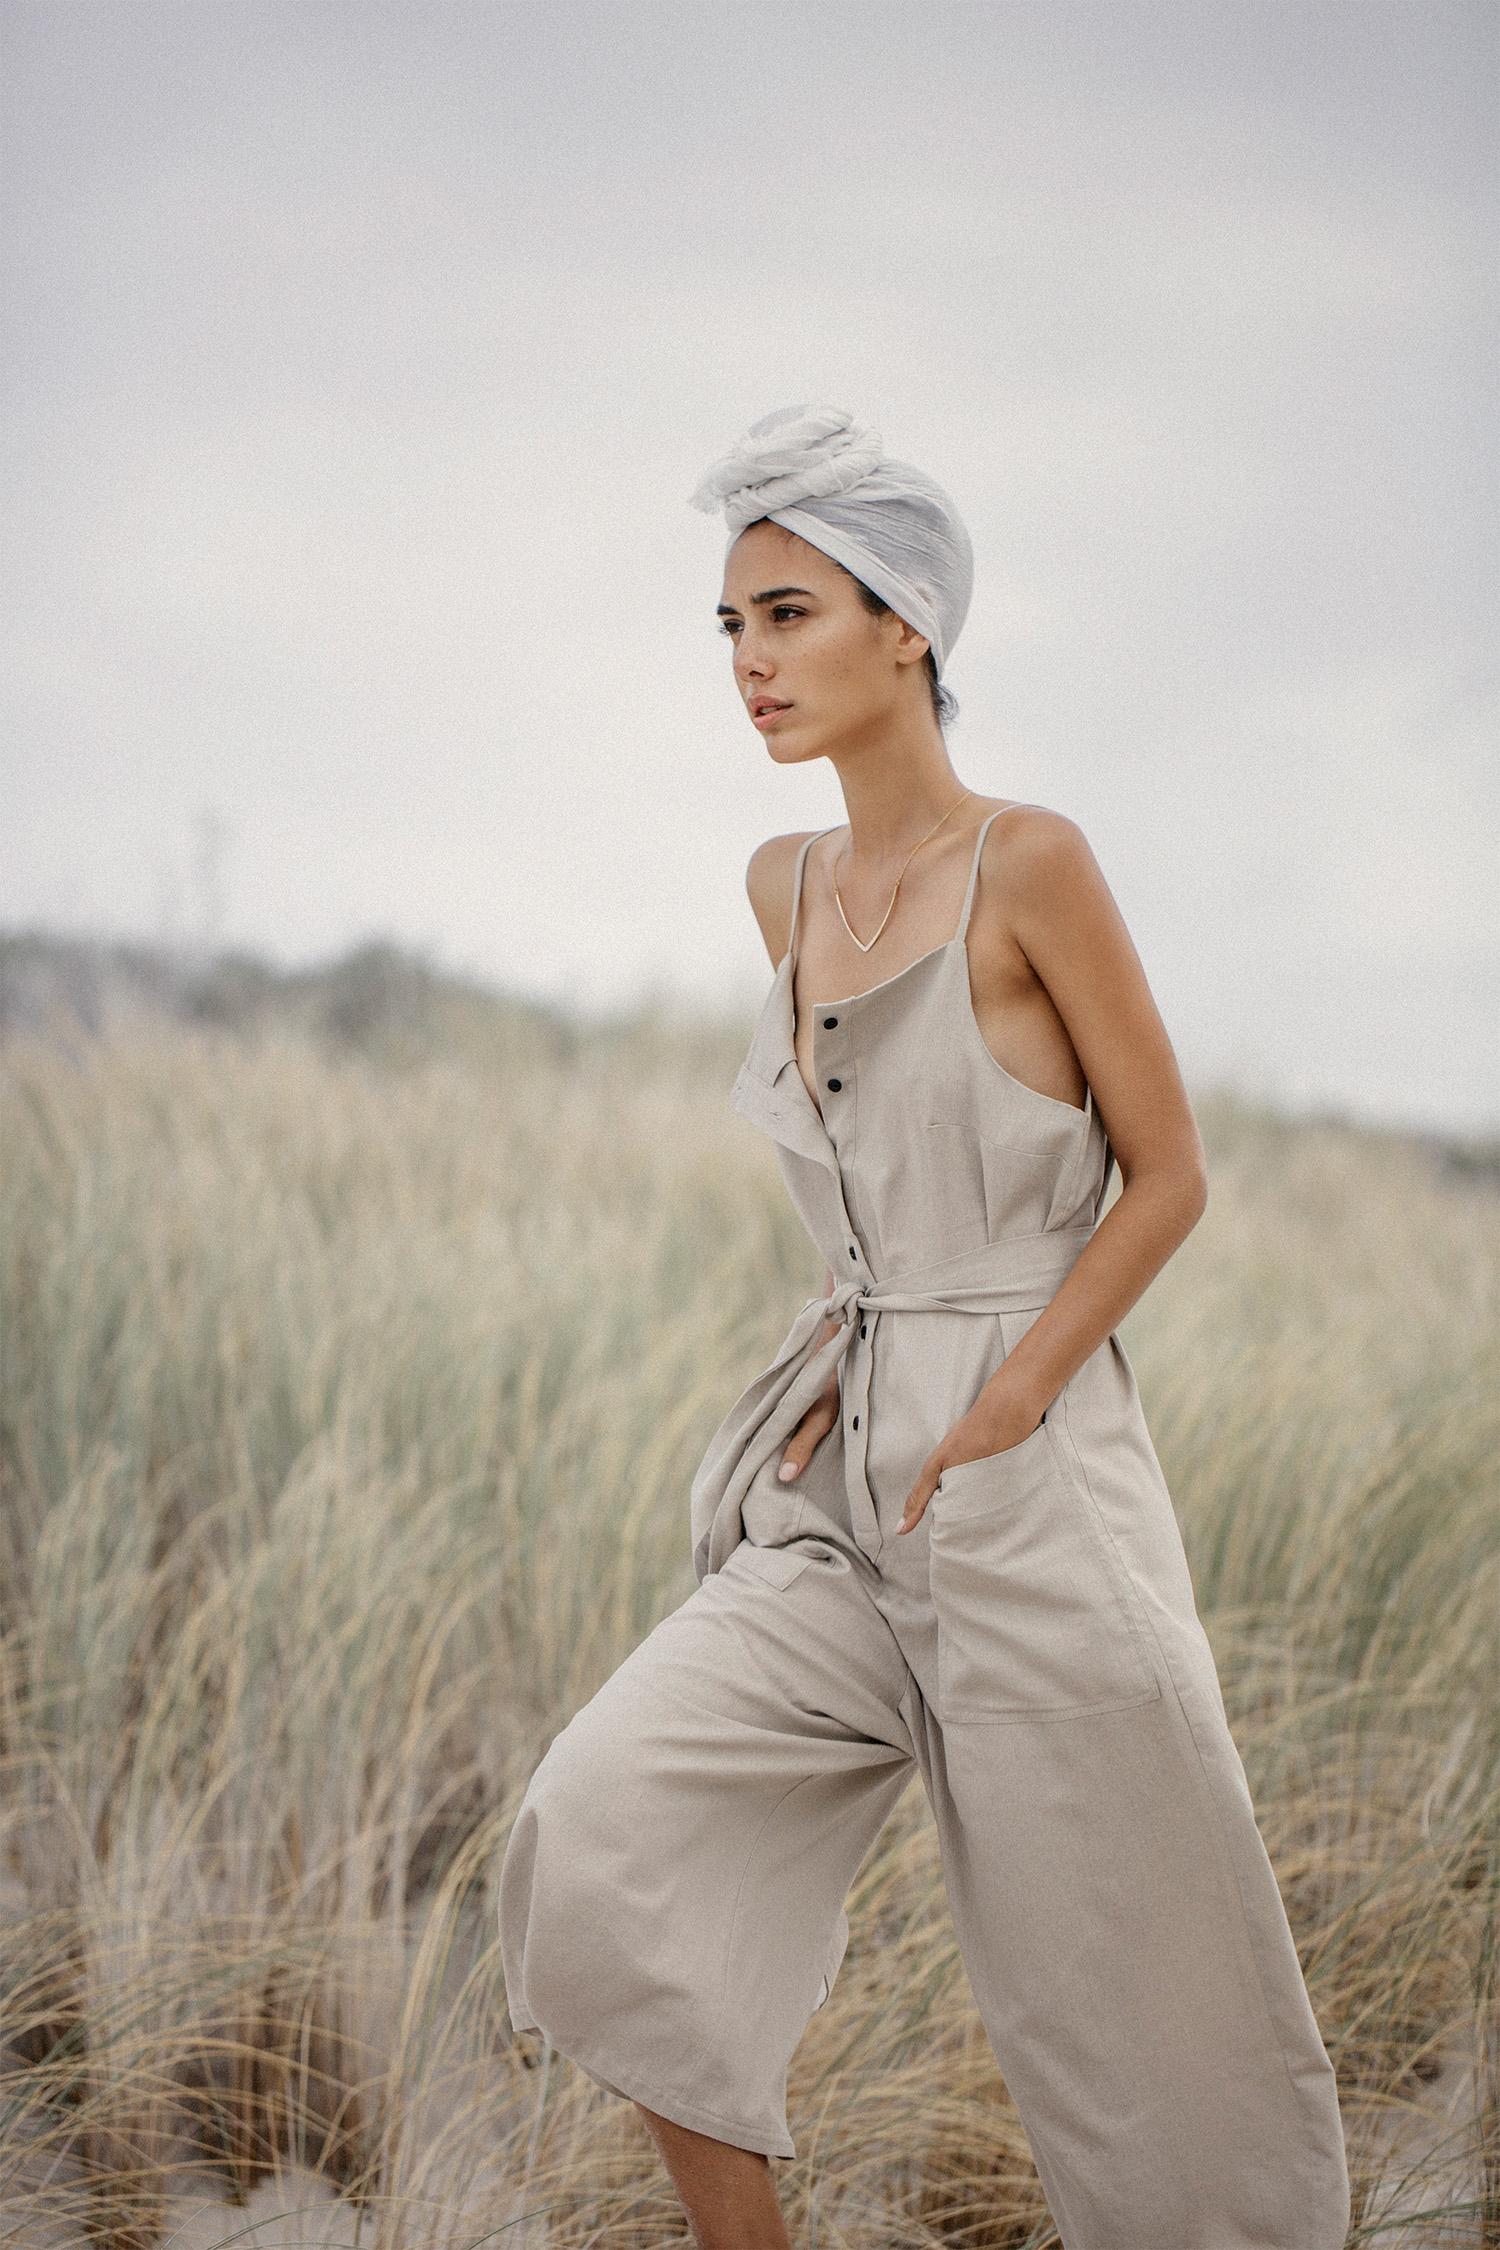 Beige jumpsuit, Selfi at Mungo & Jemima; necklace, Sarah Mulder Jewelry; head wrap, stylist's own